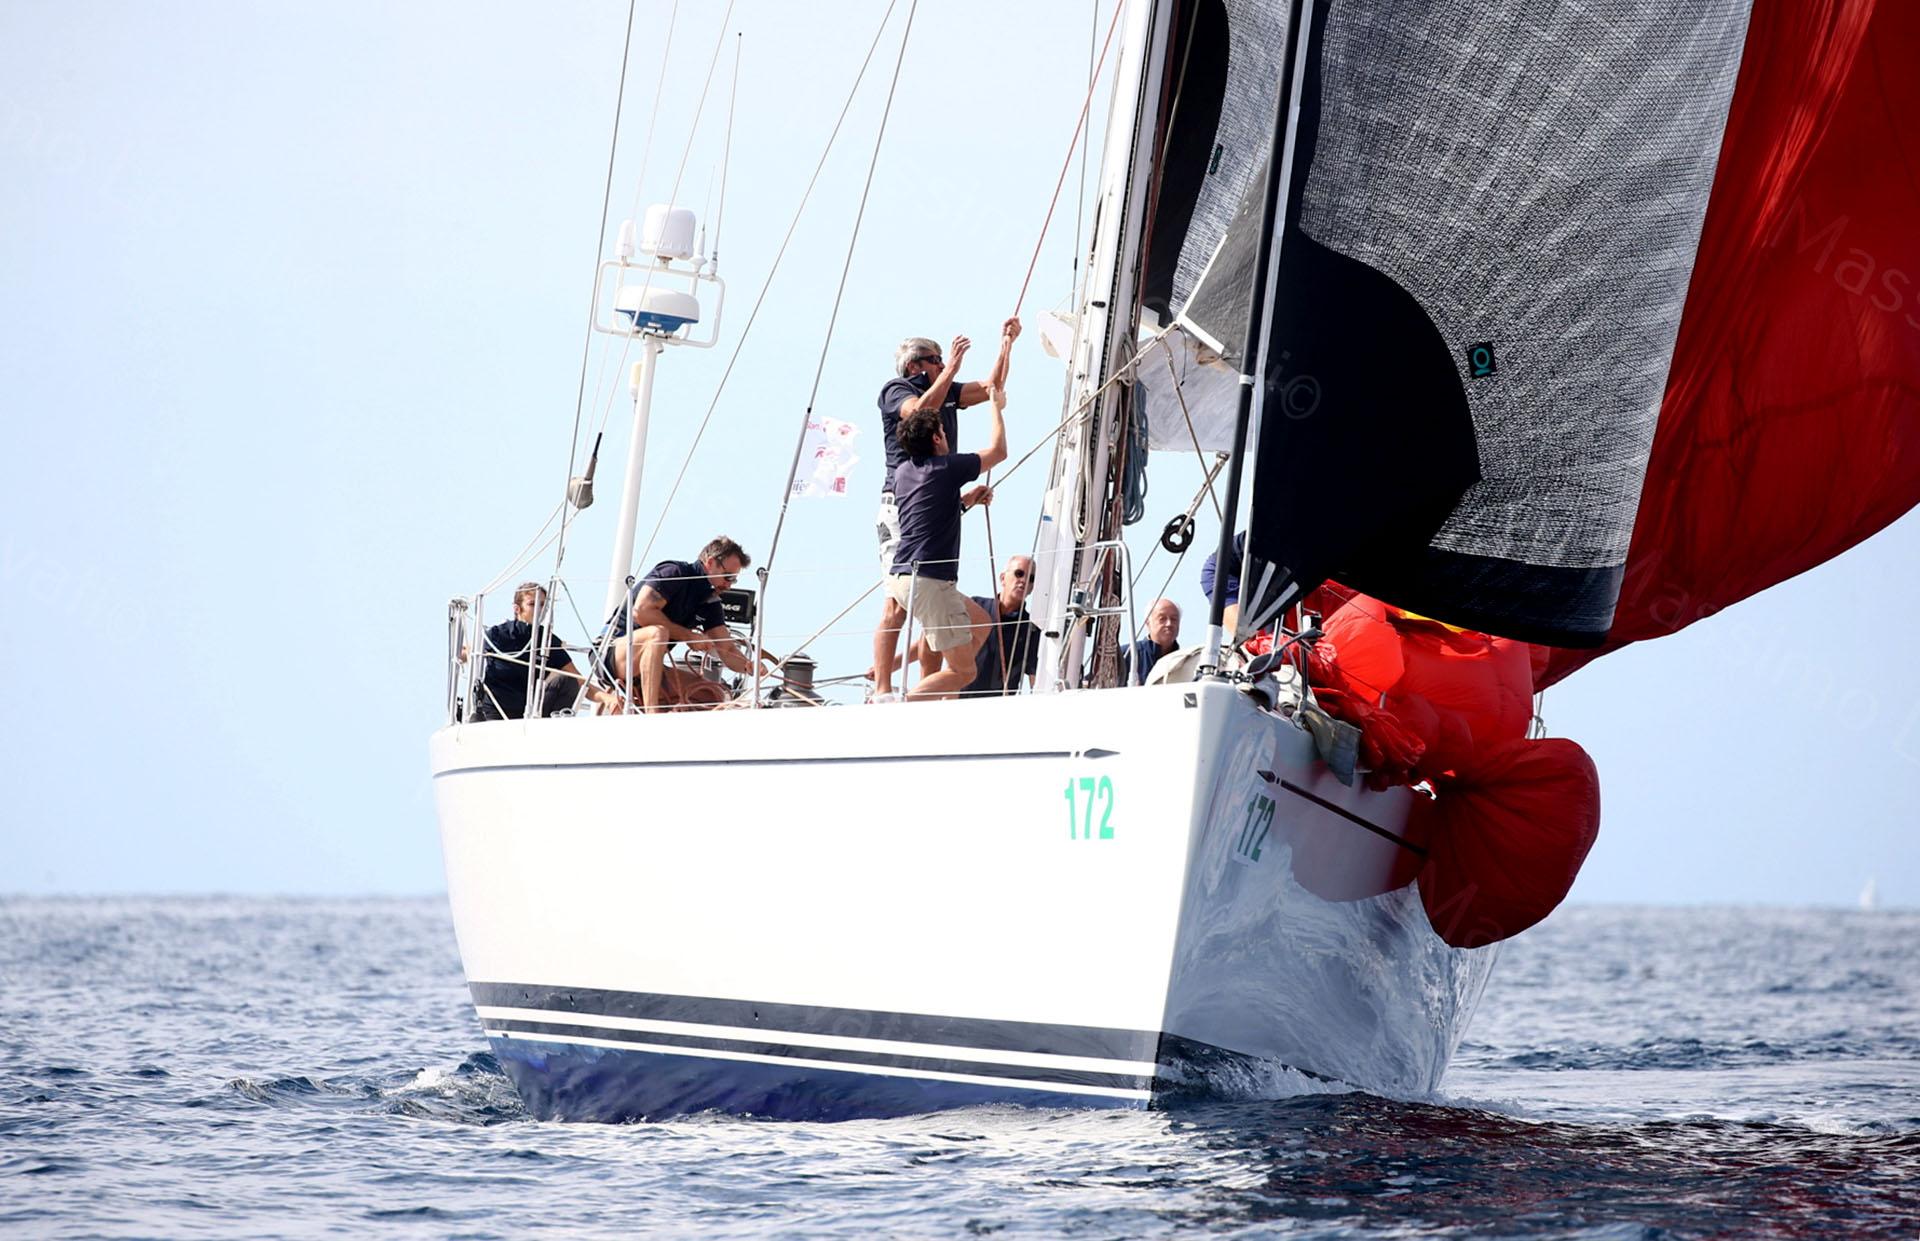 23/09/2017 Genova, Regata Millevele,nella foto manovra alle vele in prua